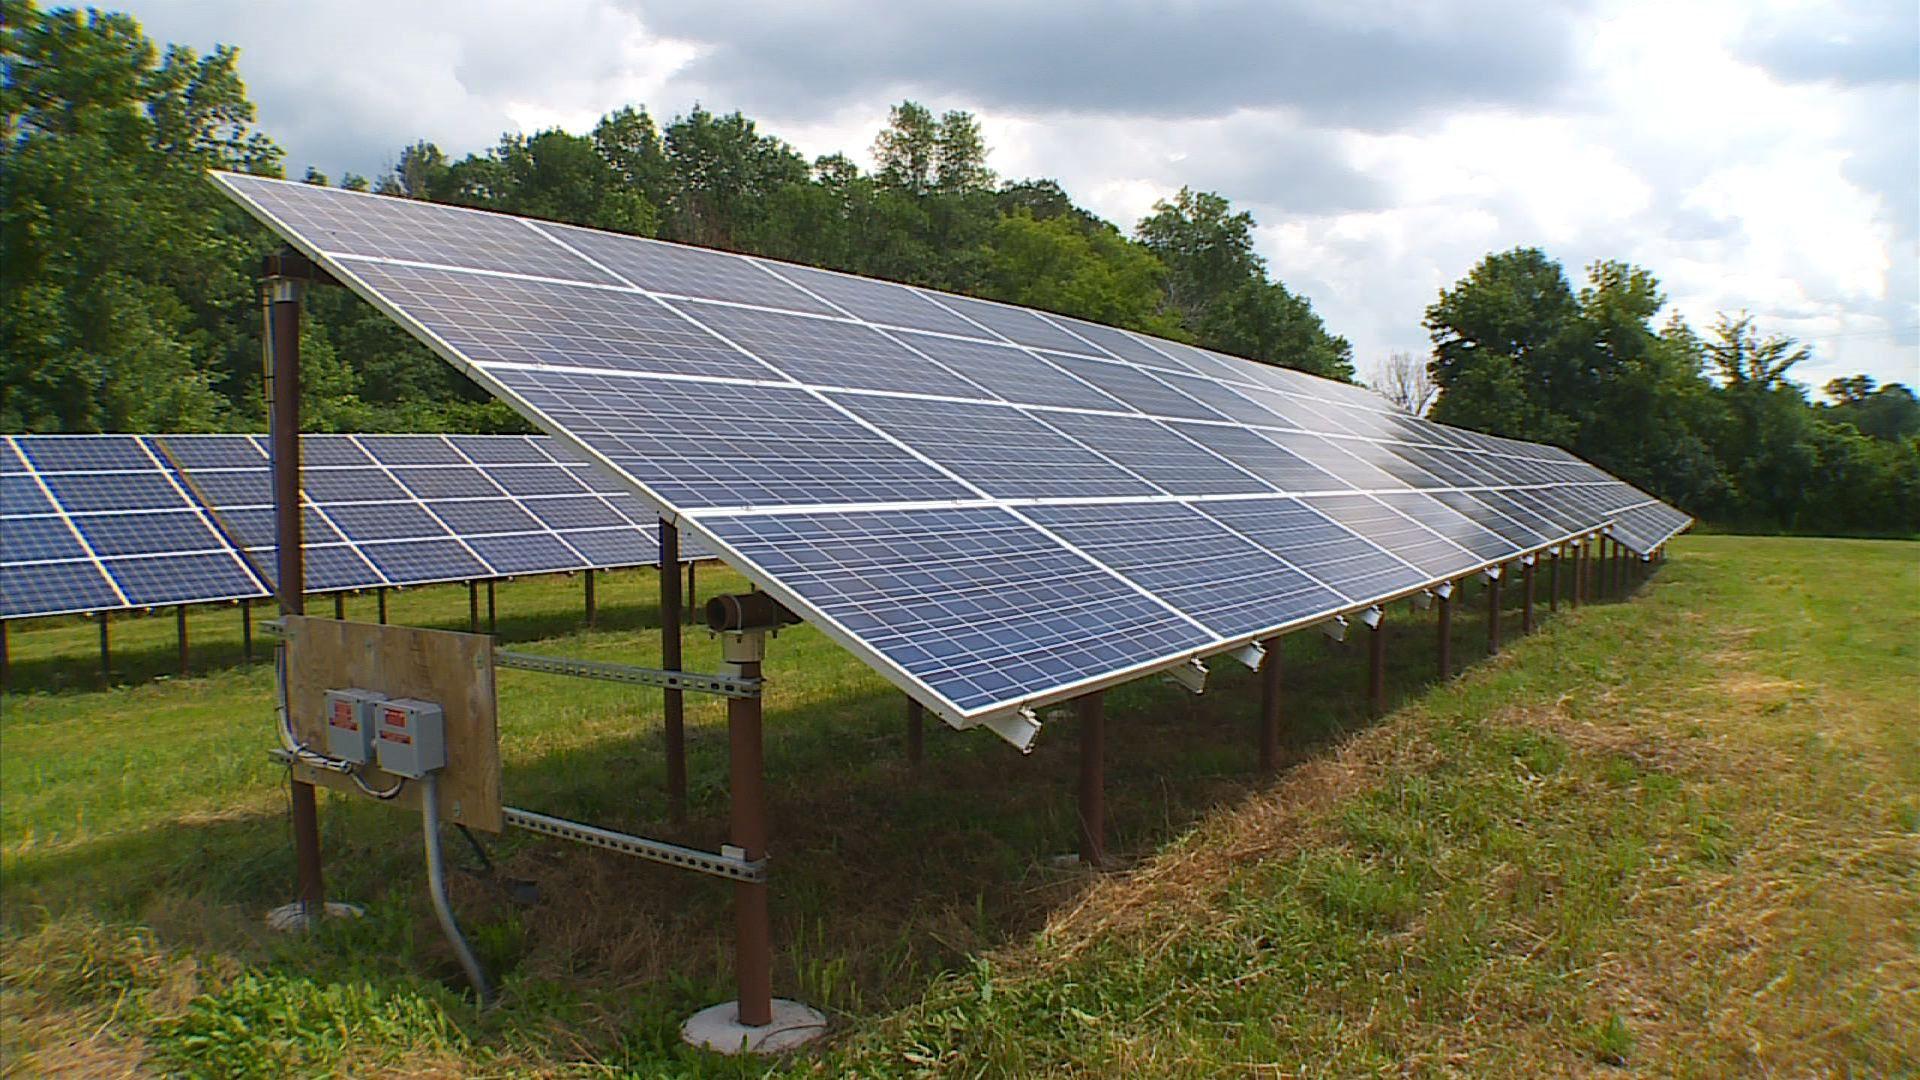 8 7 14 This Minn Farm Is Bringing Solar Power To Its Community Cbs Minnesota Anybody That S In Xcel Energy Territory Solar Solar Power Roof Solar Panel